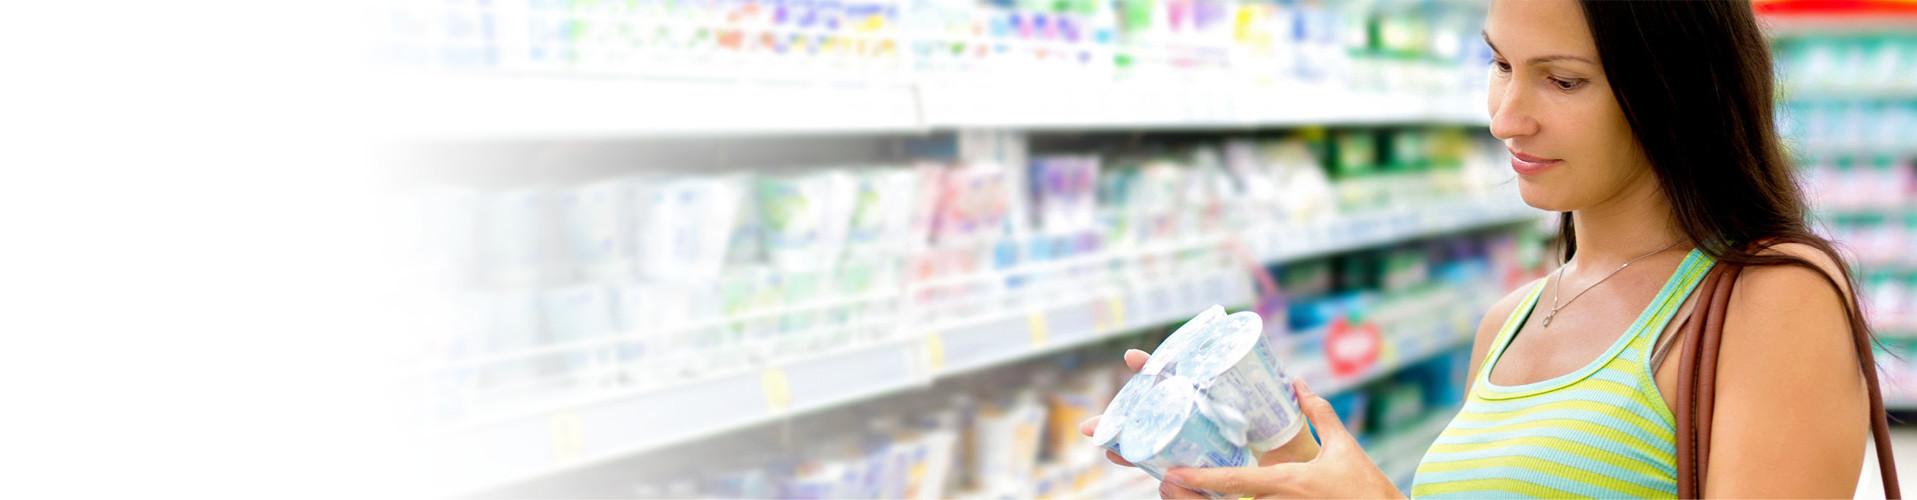 Frau steht im Supermarkt und prüft Joghurt © Korta, stock.adobe.com